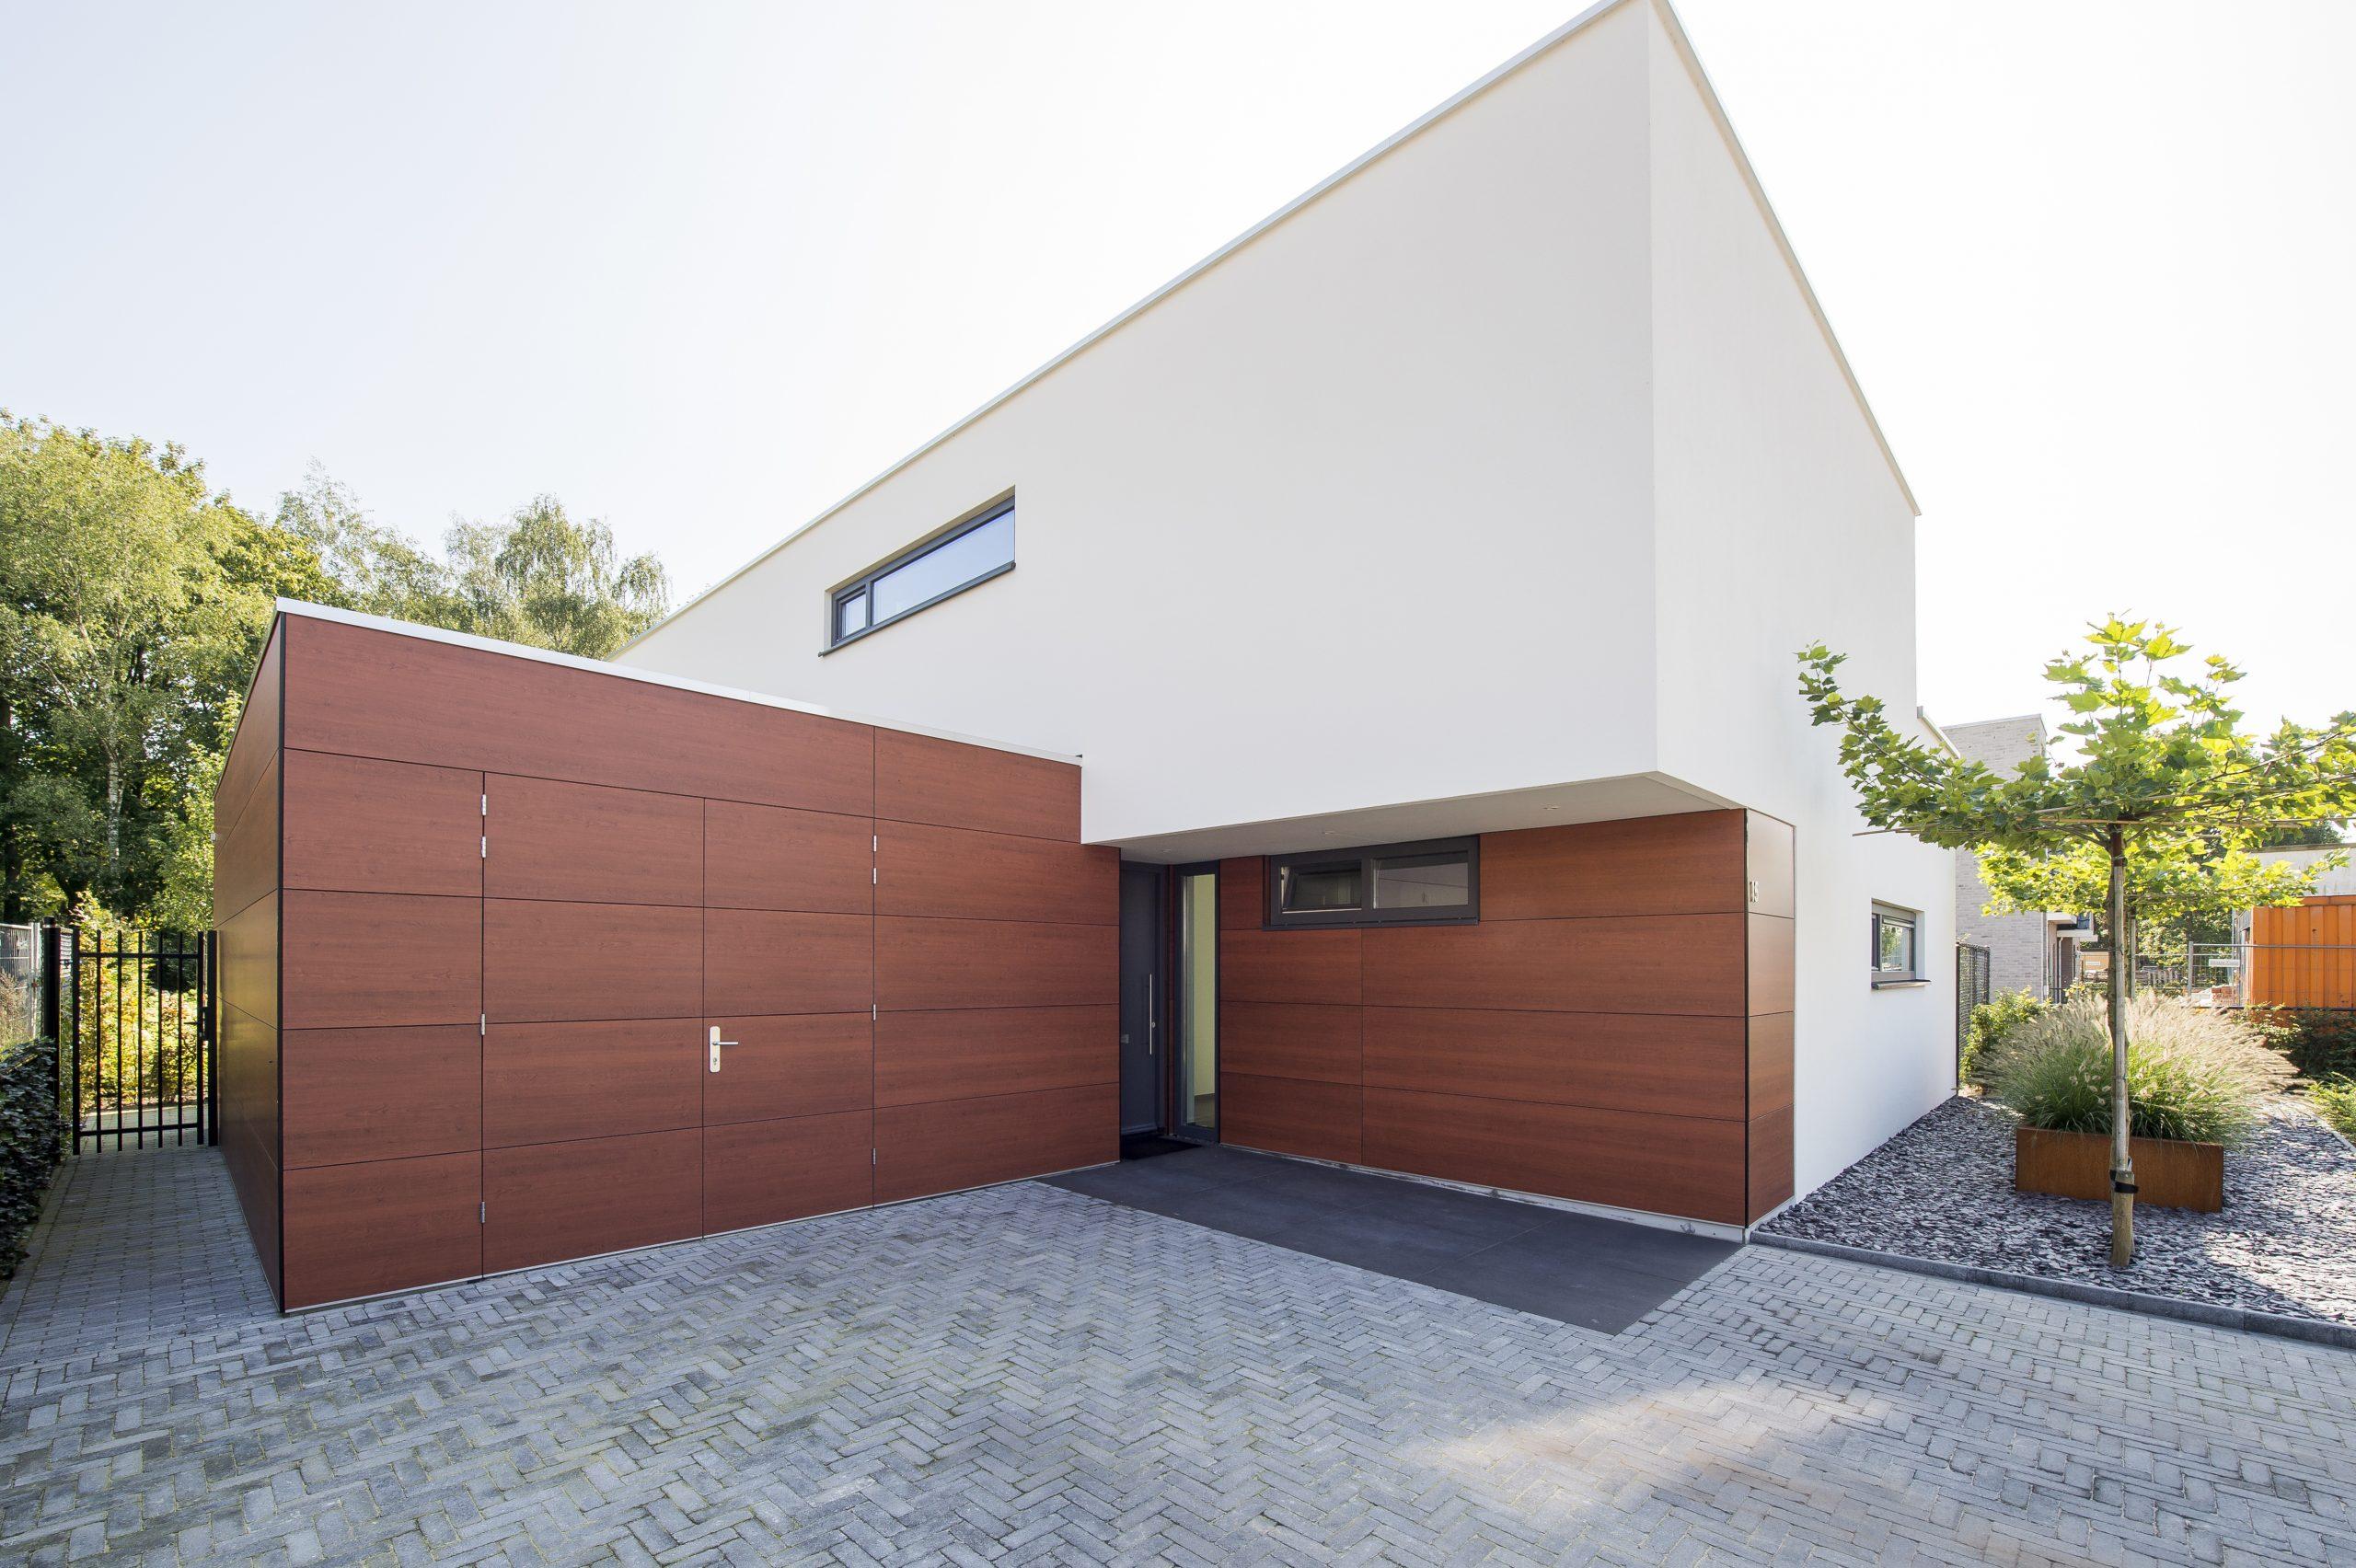 Moderne prefab villa van Janssen-bouw